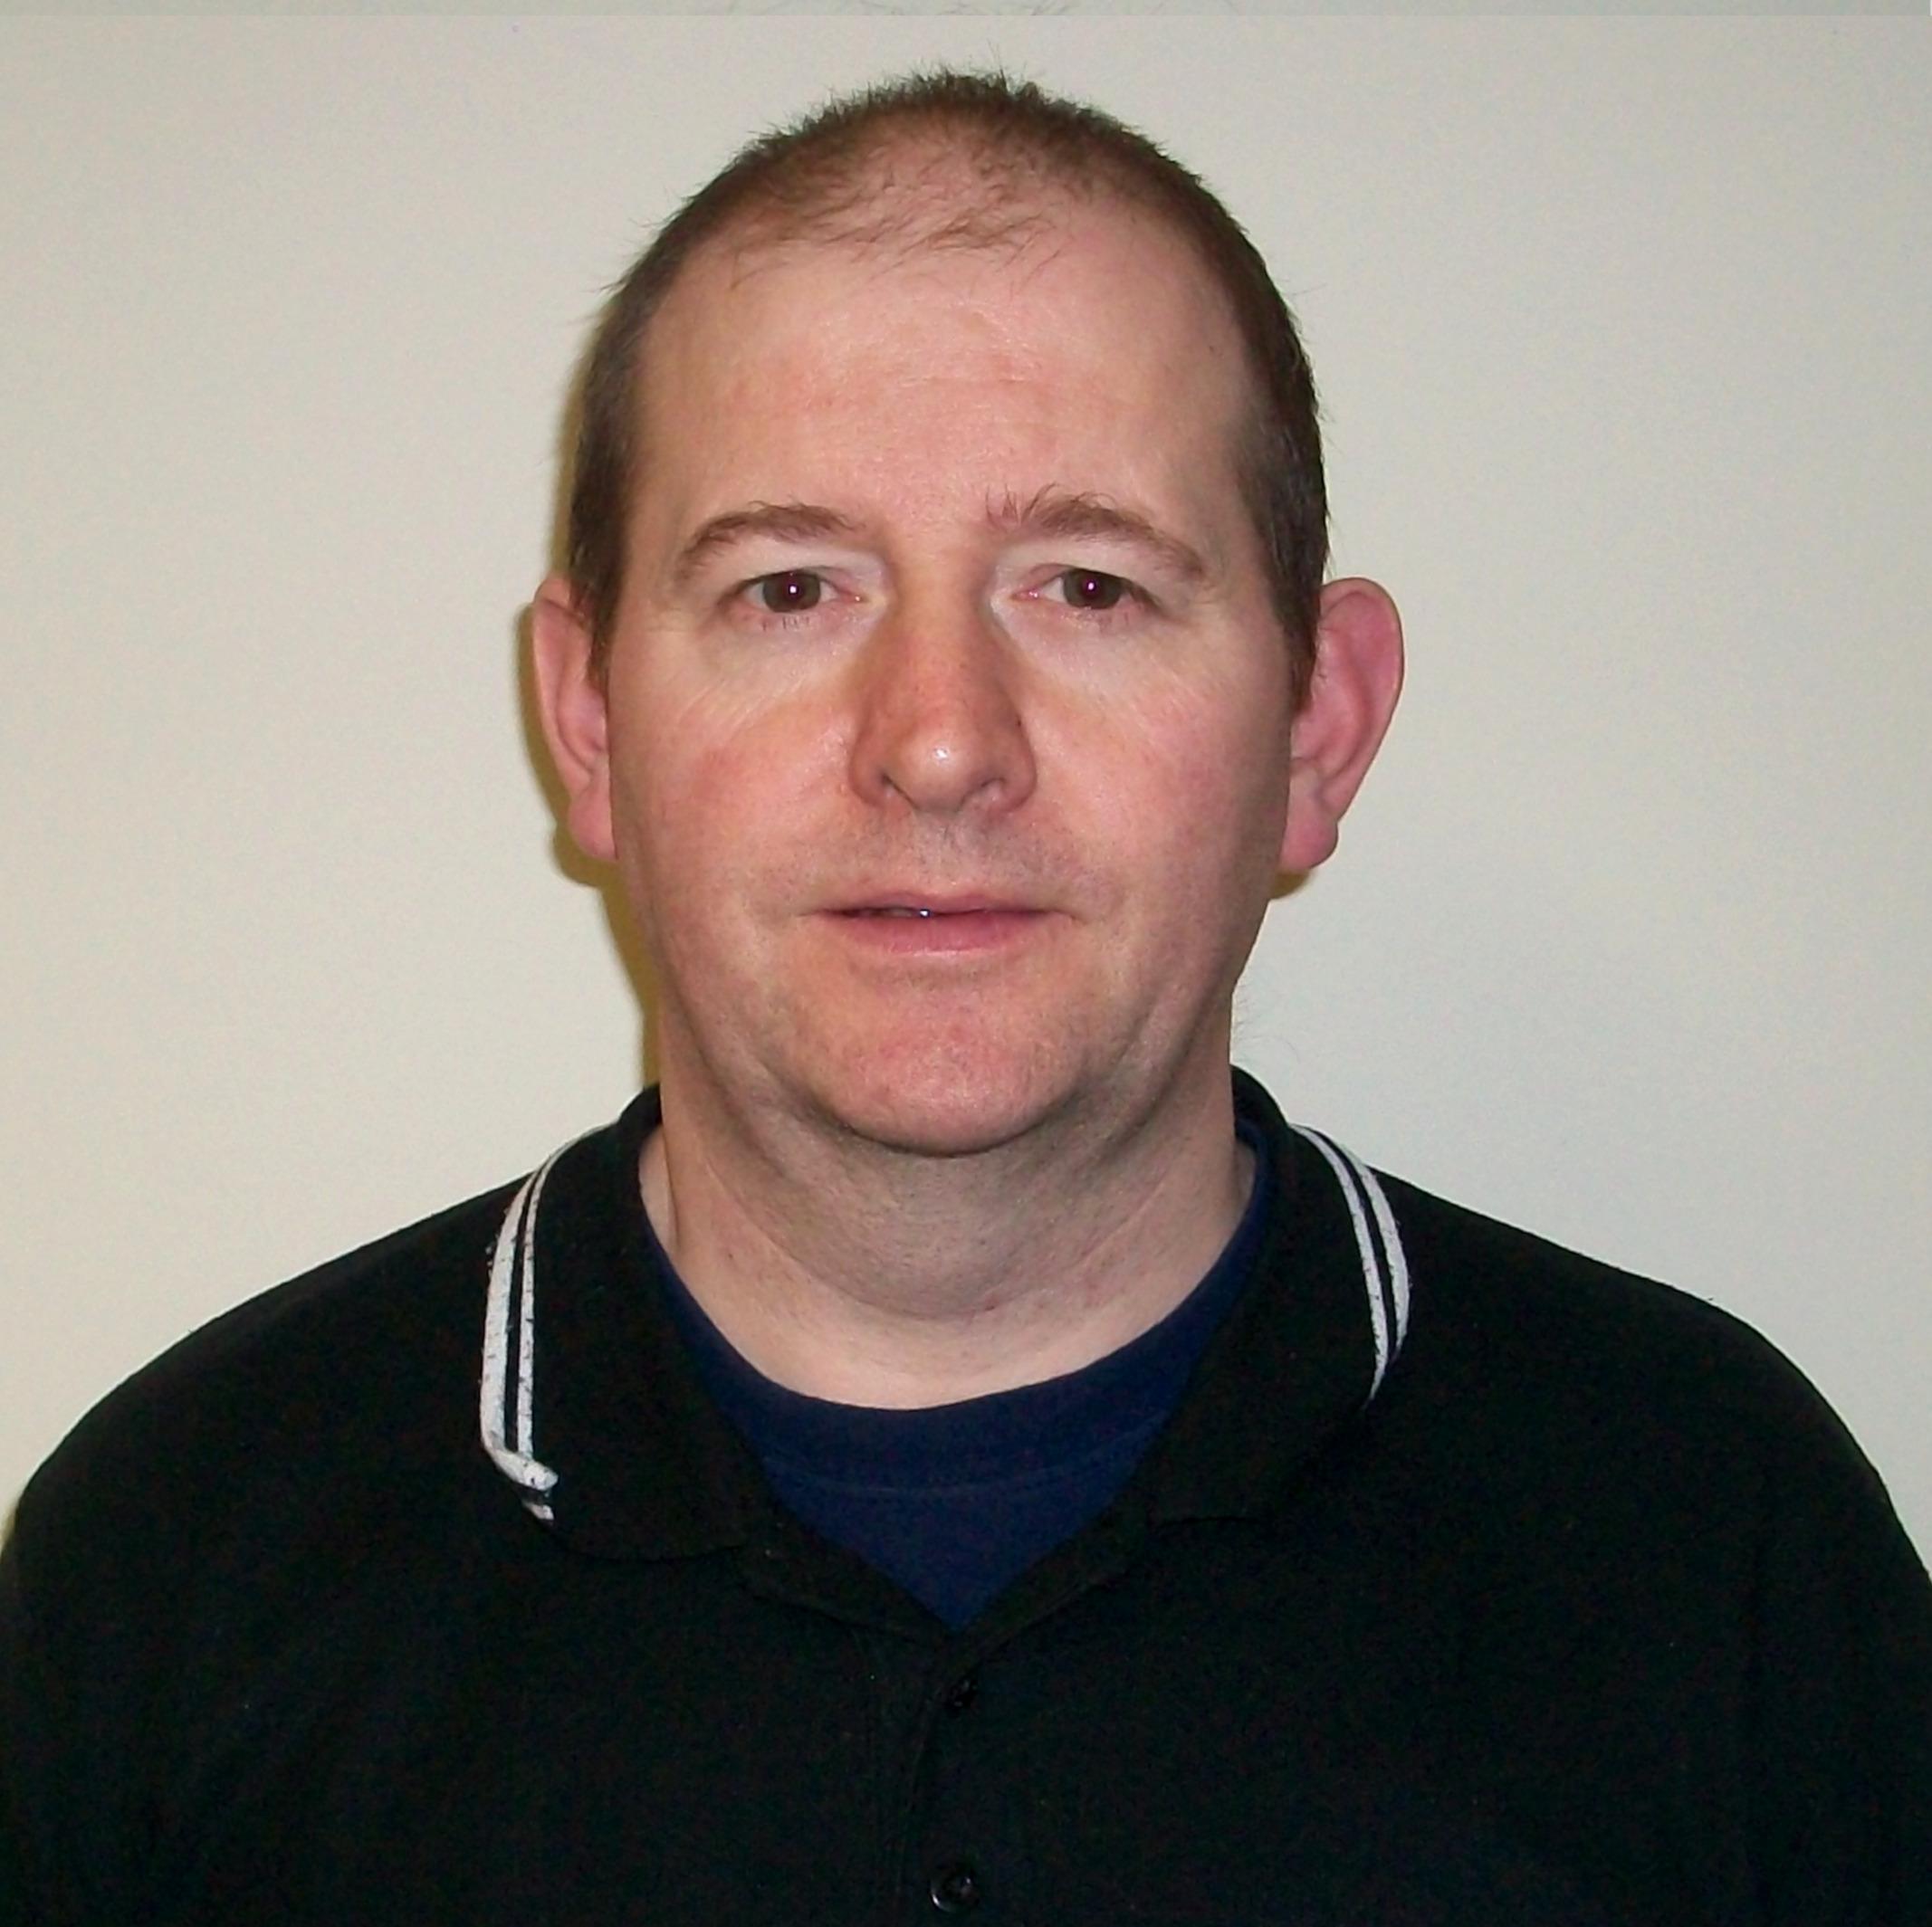 An Image of the Maintenace Manager John Duthie